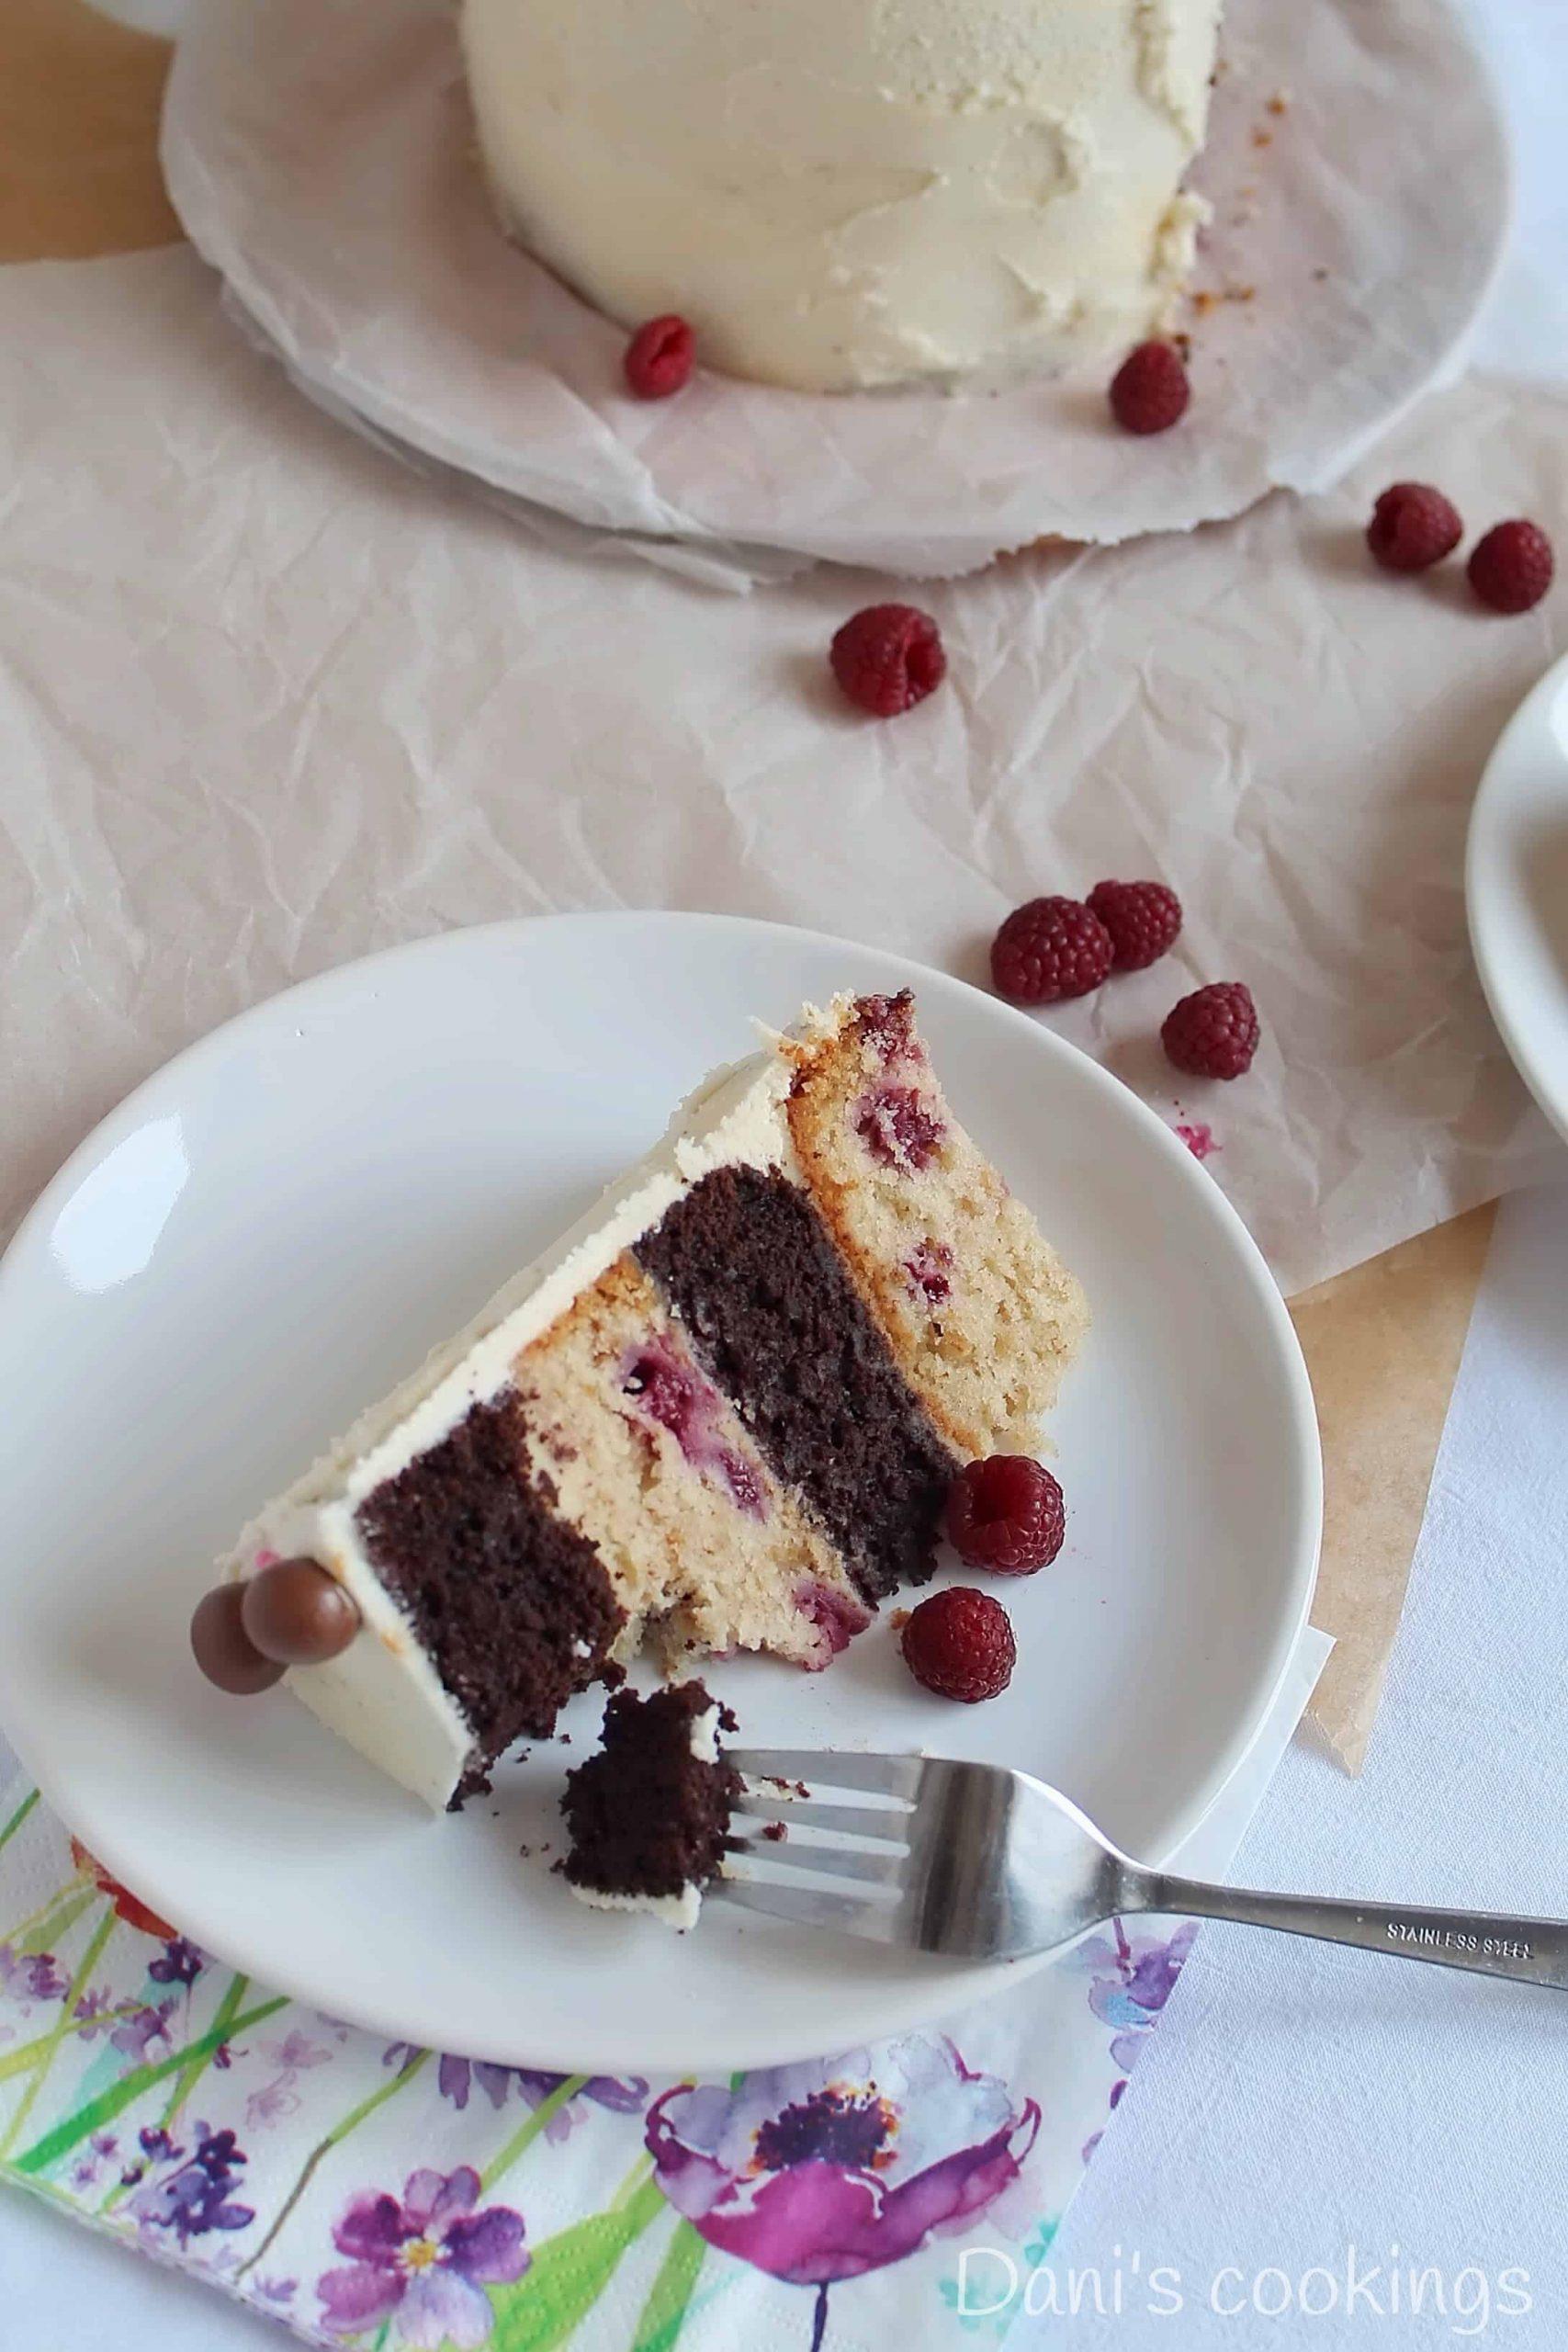 a slice of cake being eaten